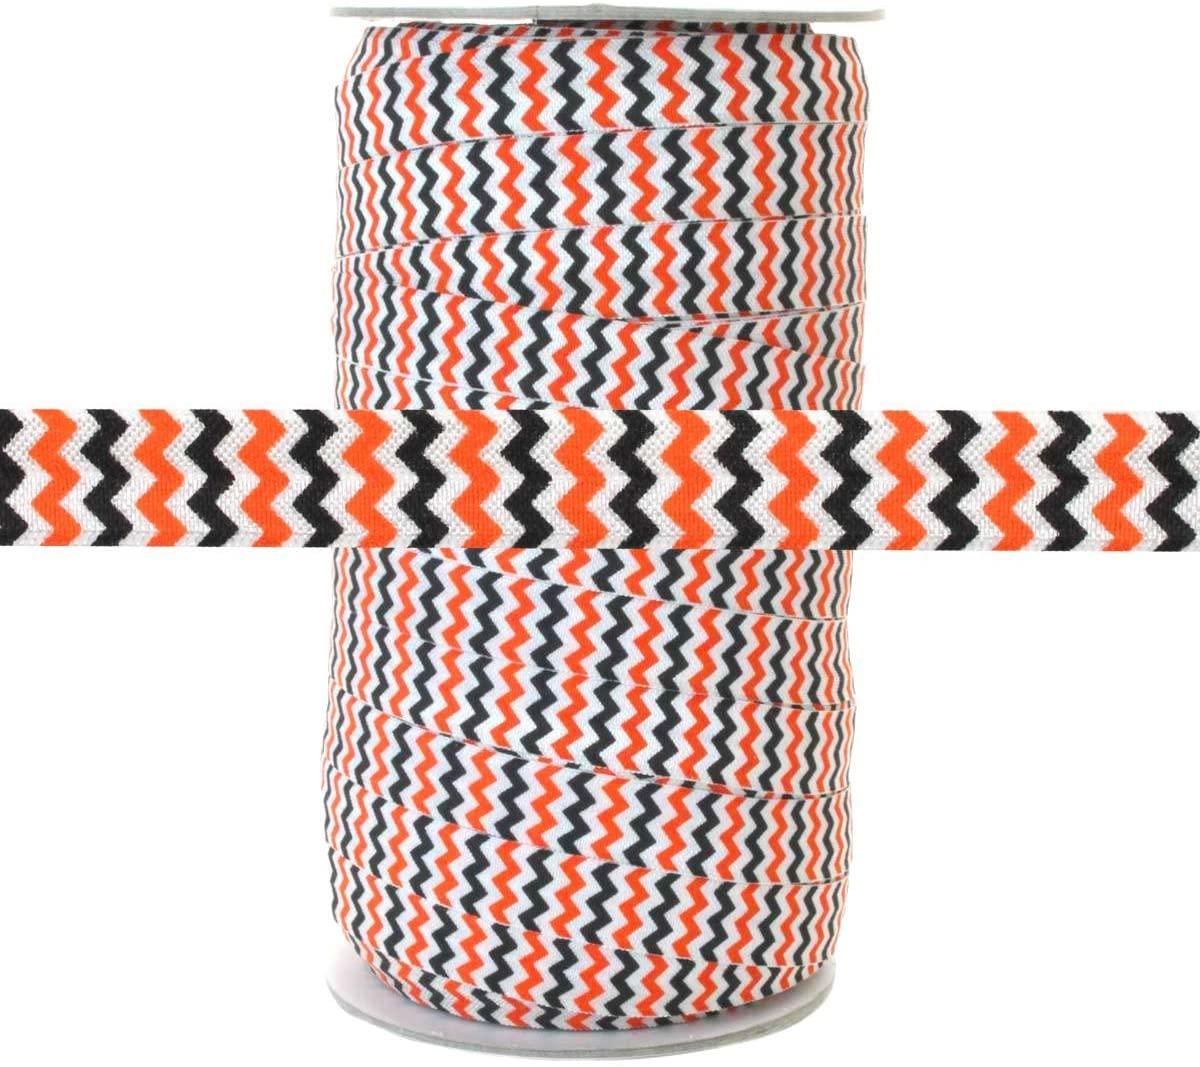 100 Yards - Orange and Black Chevron on White - 5/8